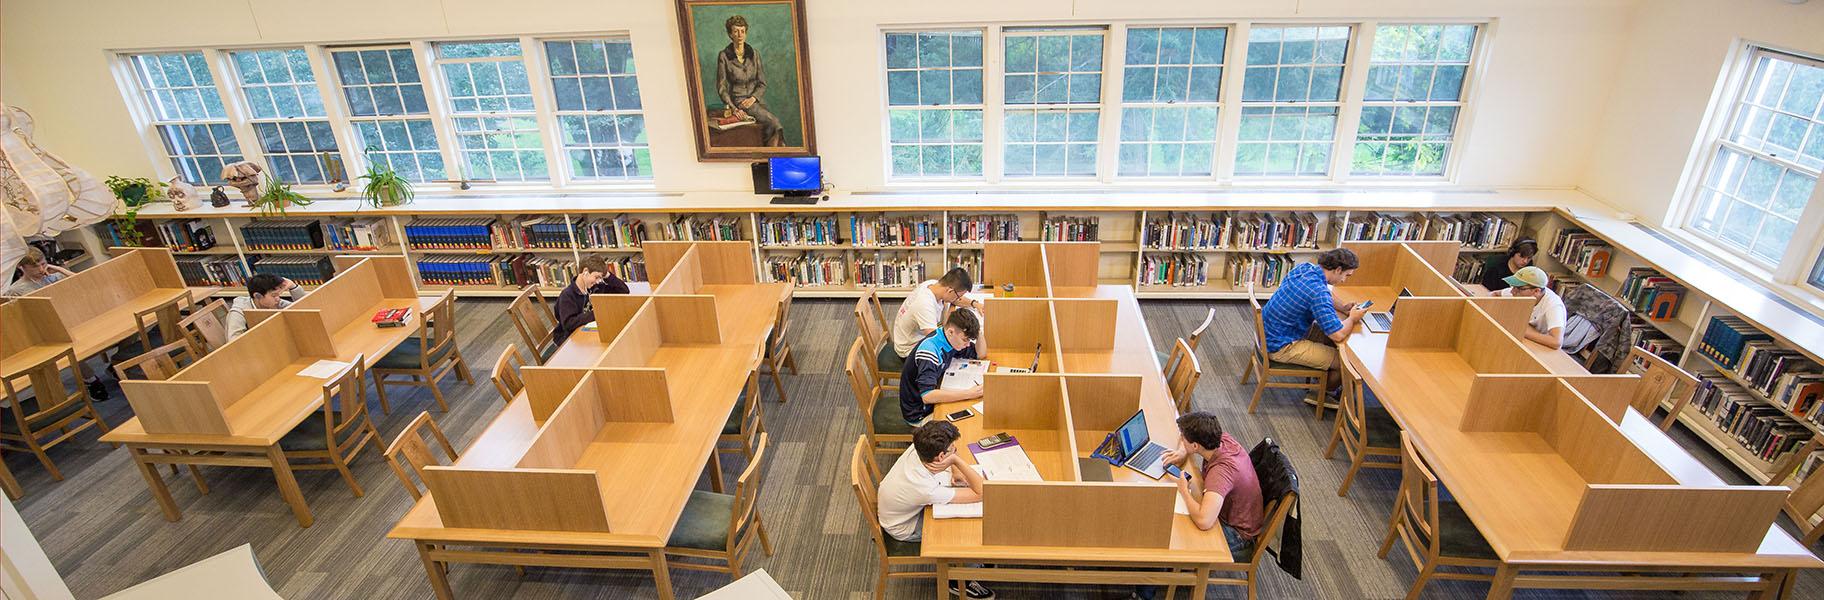 J. Josephine Tucker Library 3